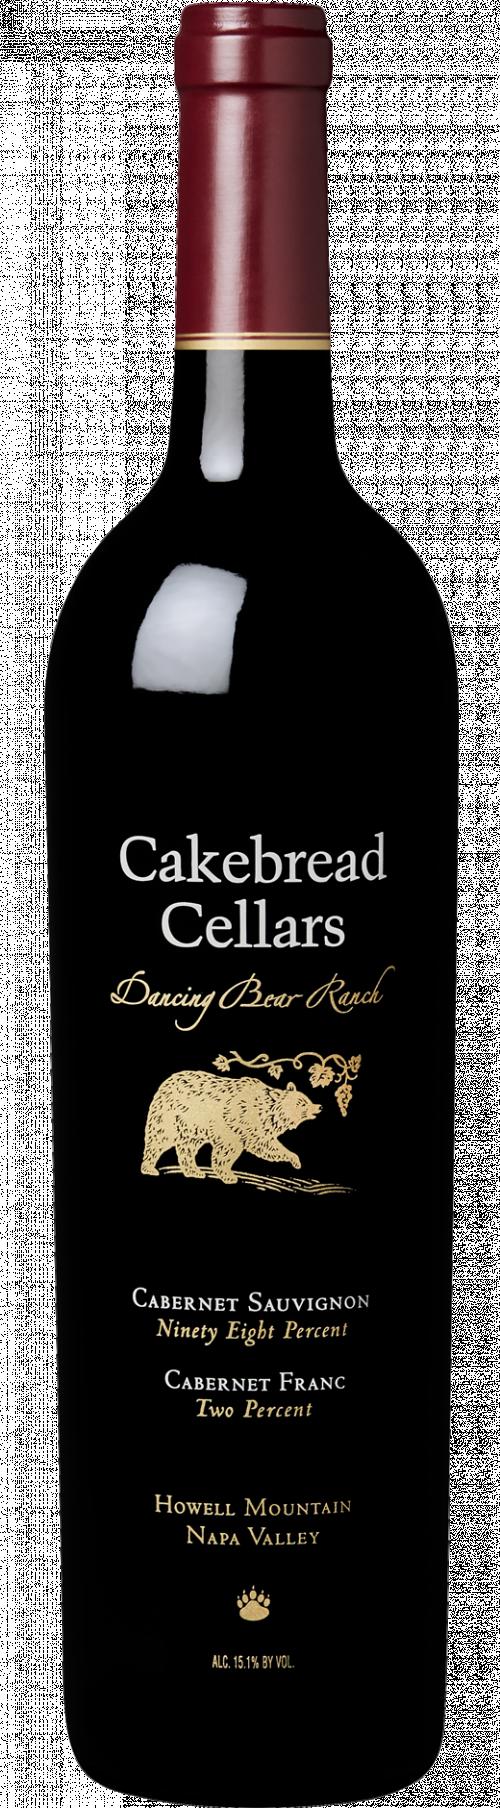 2017 Cakebread Cellars Dancing Bear Ranch Cabernet Sauvignon 750ml